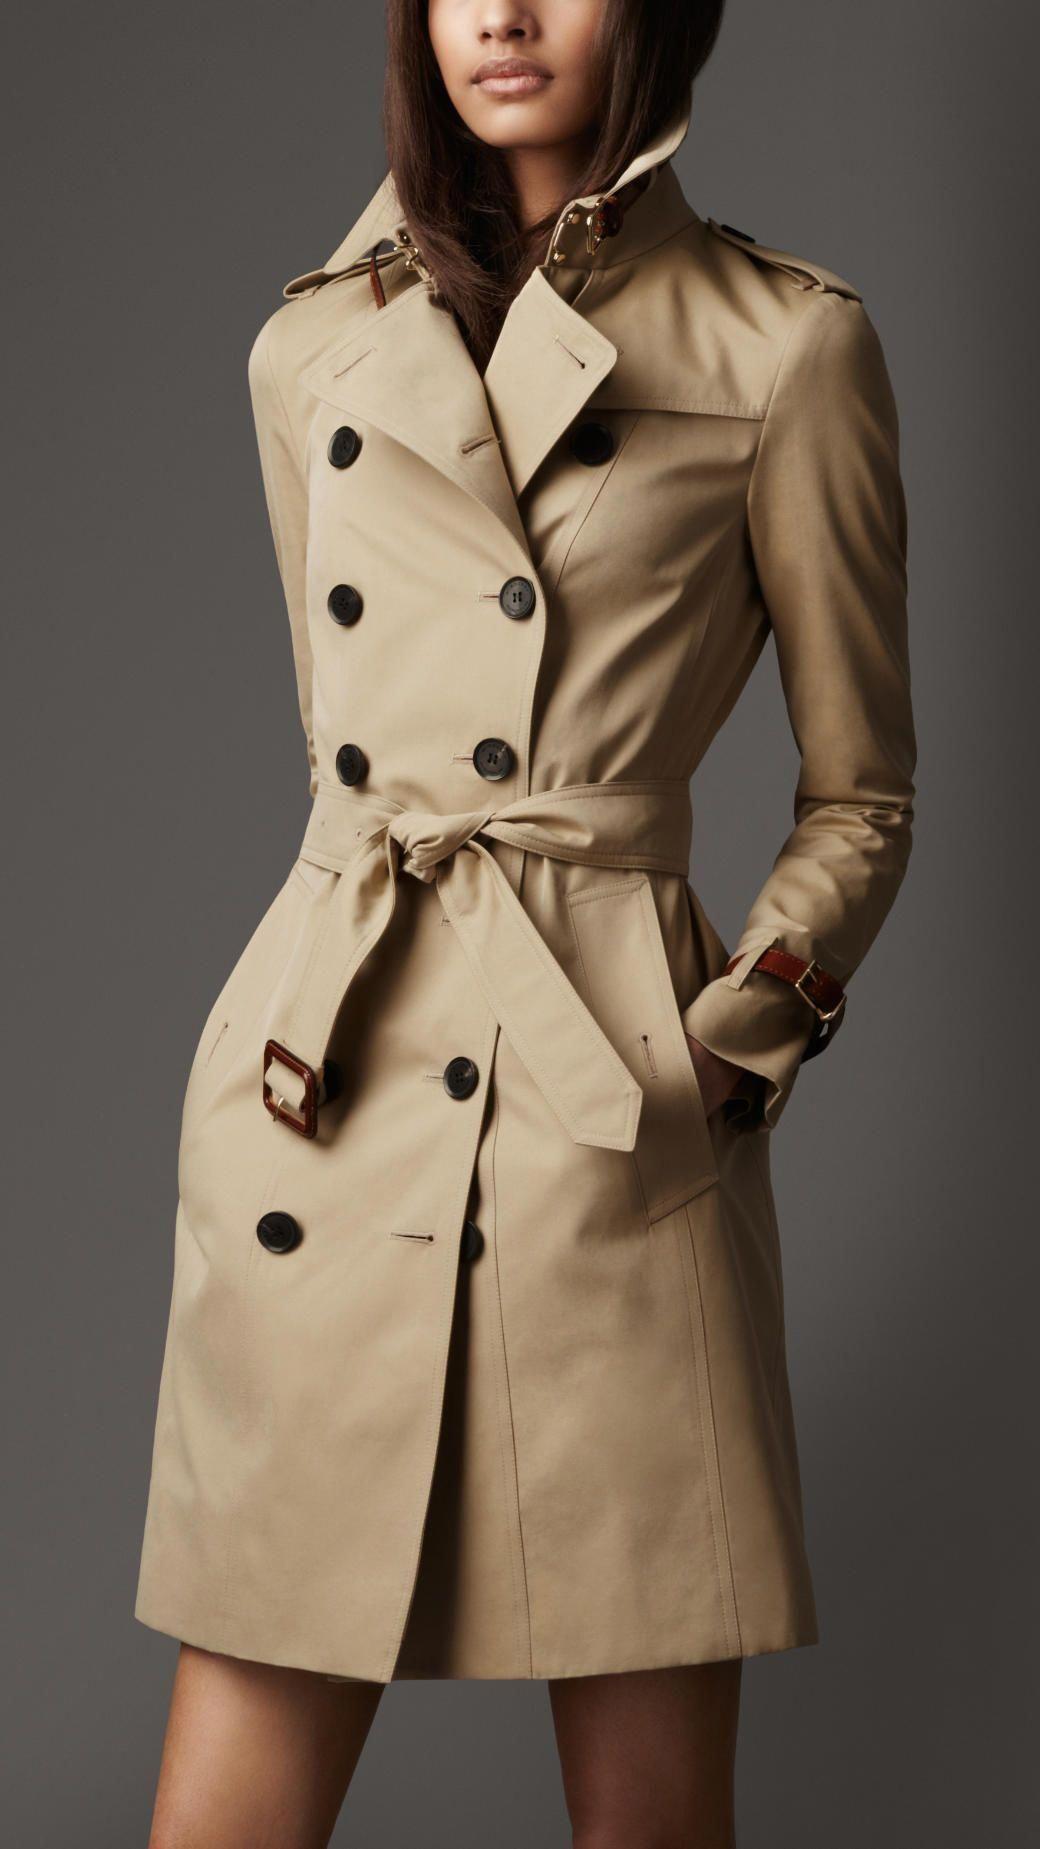 Womensraincoatsize18 Bestwomensraincoatforhiking Burberry Trenchcoat Damen Trenchcoat Burberry Mantel Damen